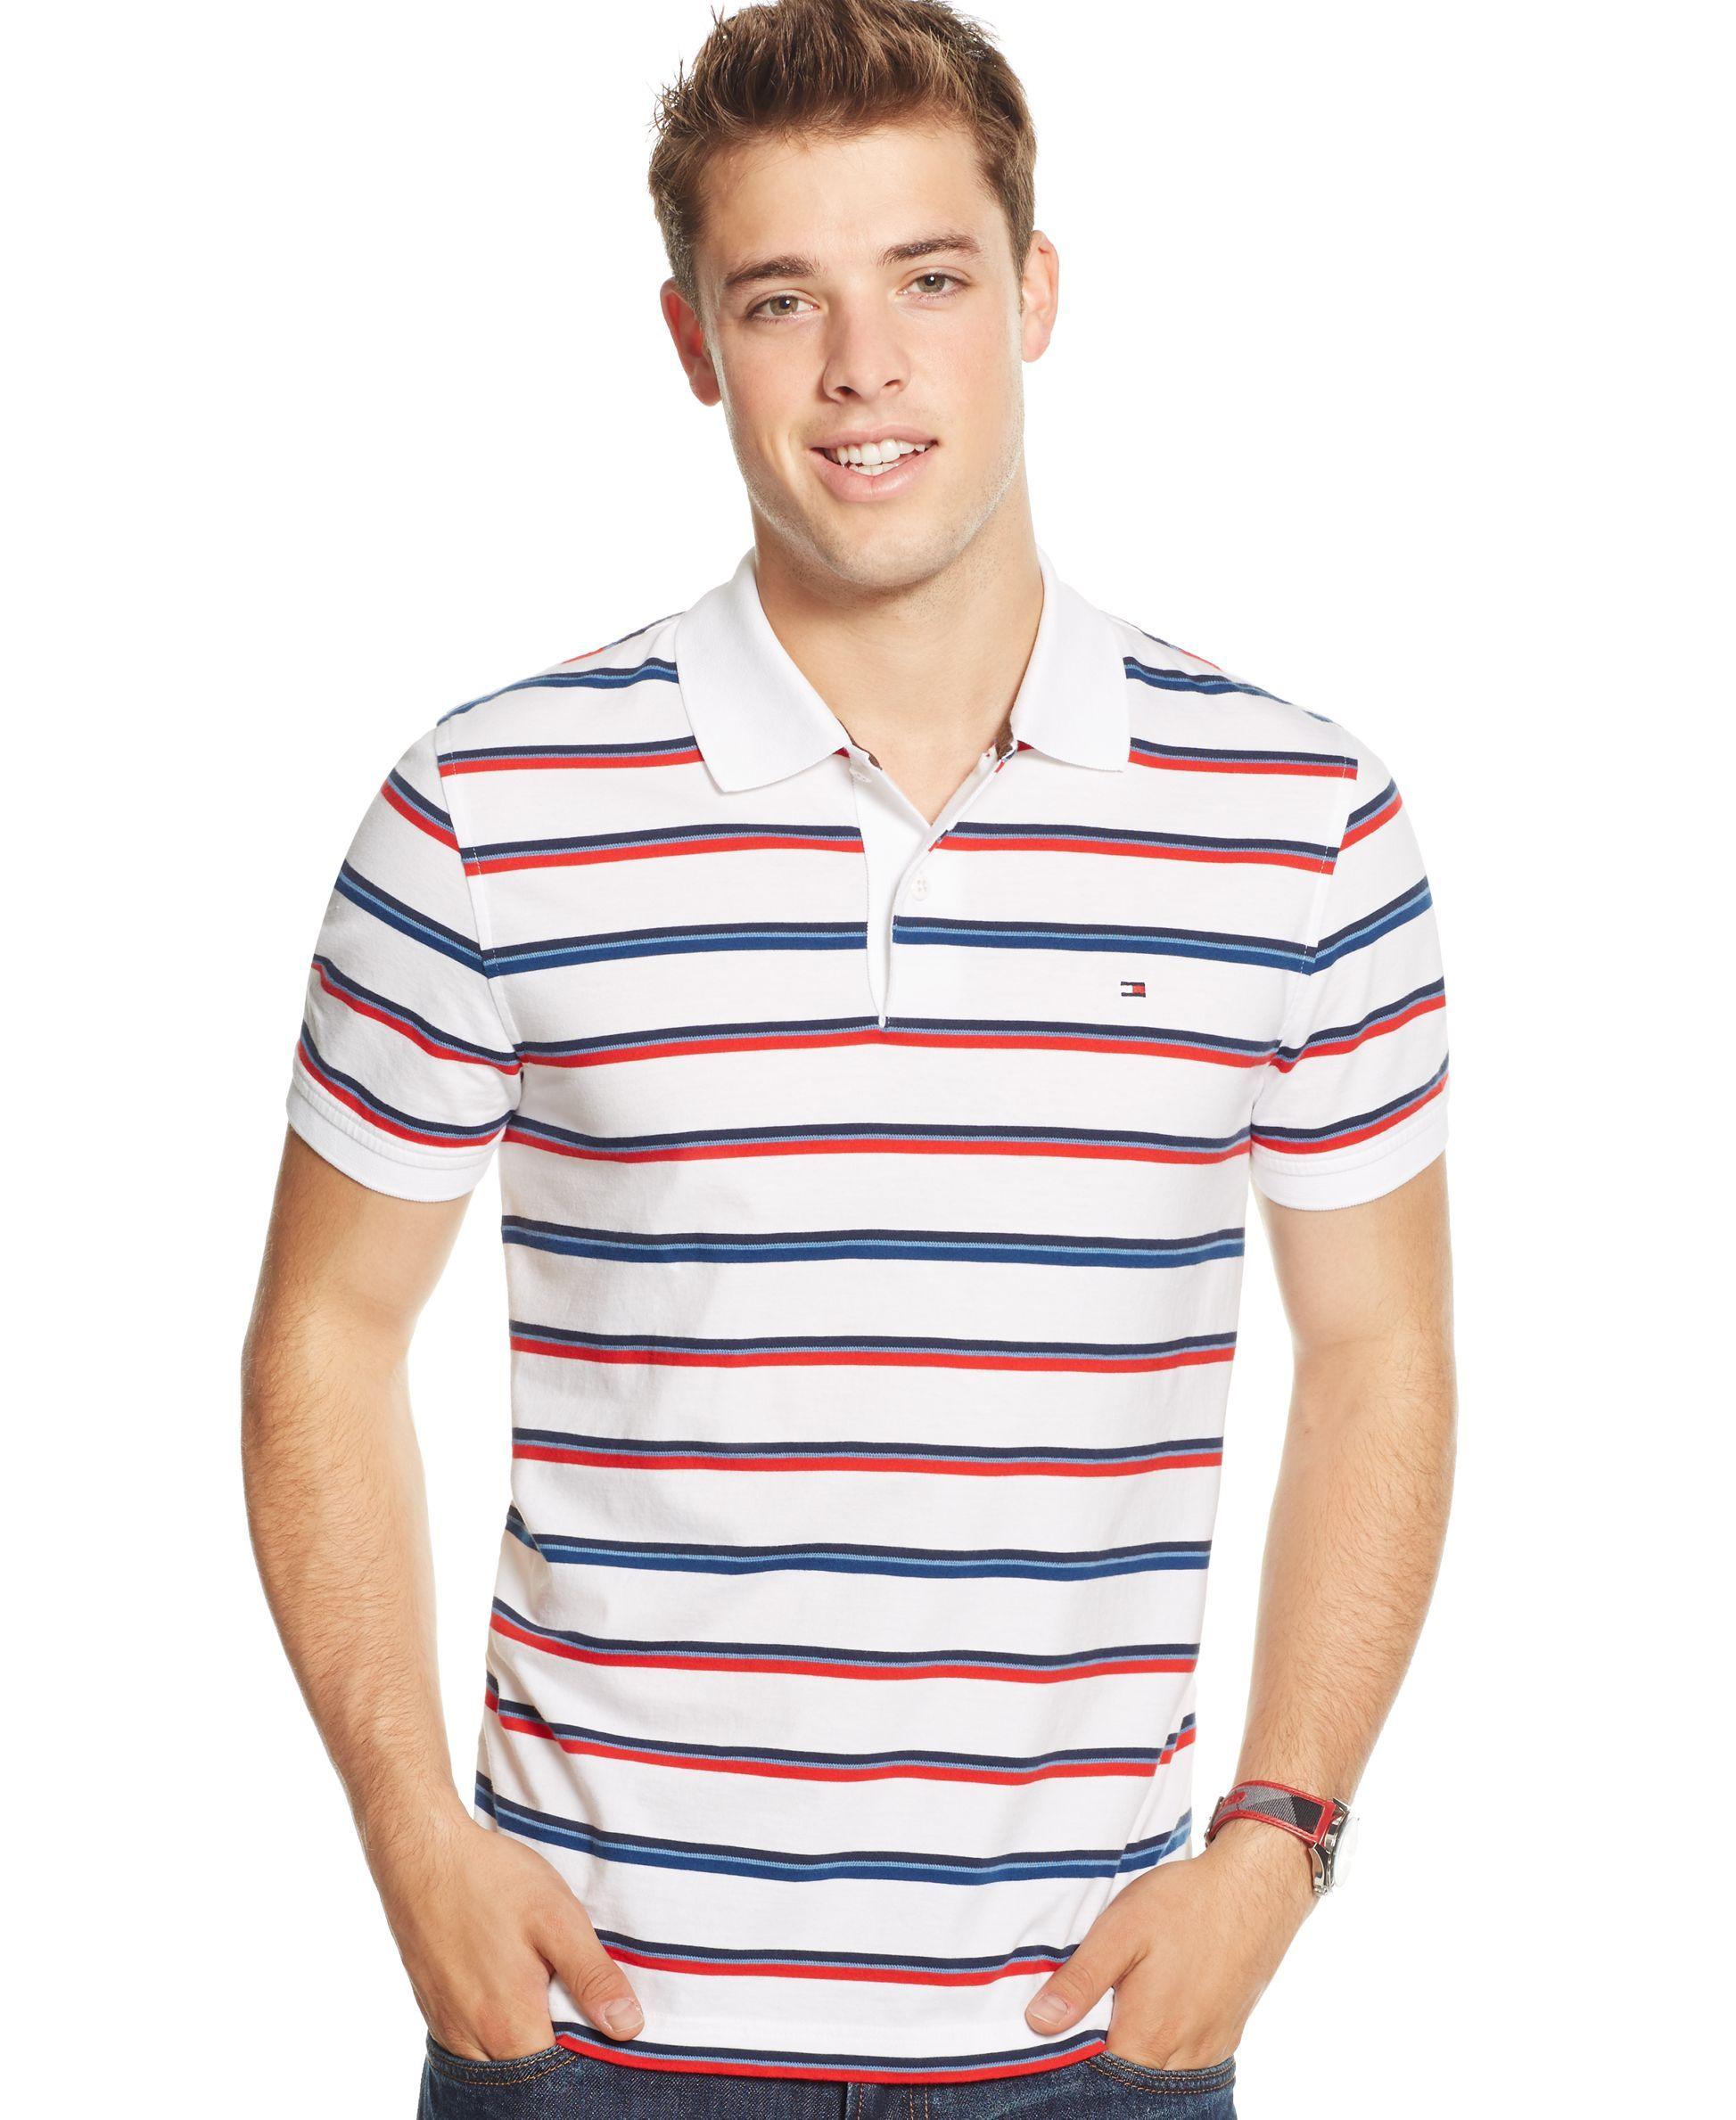 84e63e103 Tommy Hilfiger Striped Polo Shirt | stripers in 2019 | Striped polo ...